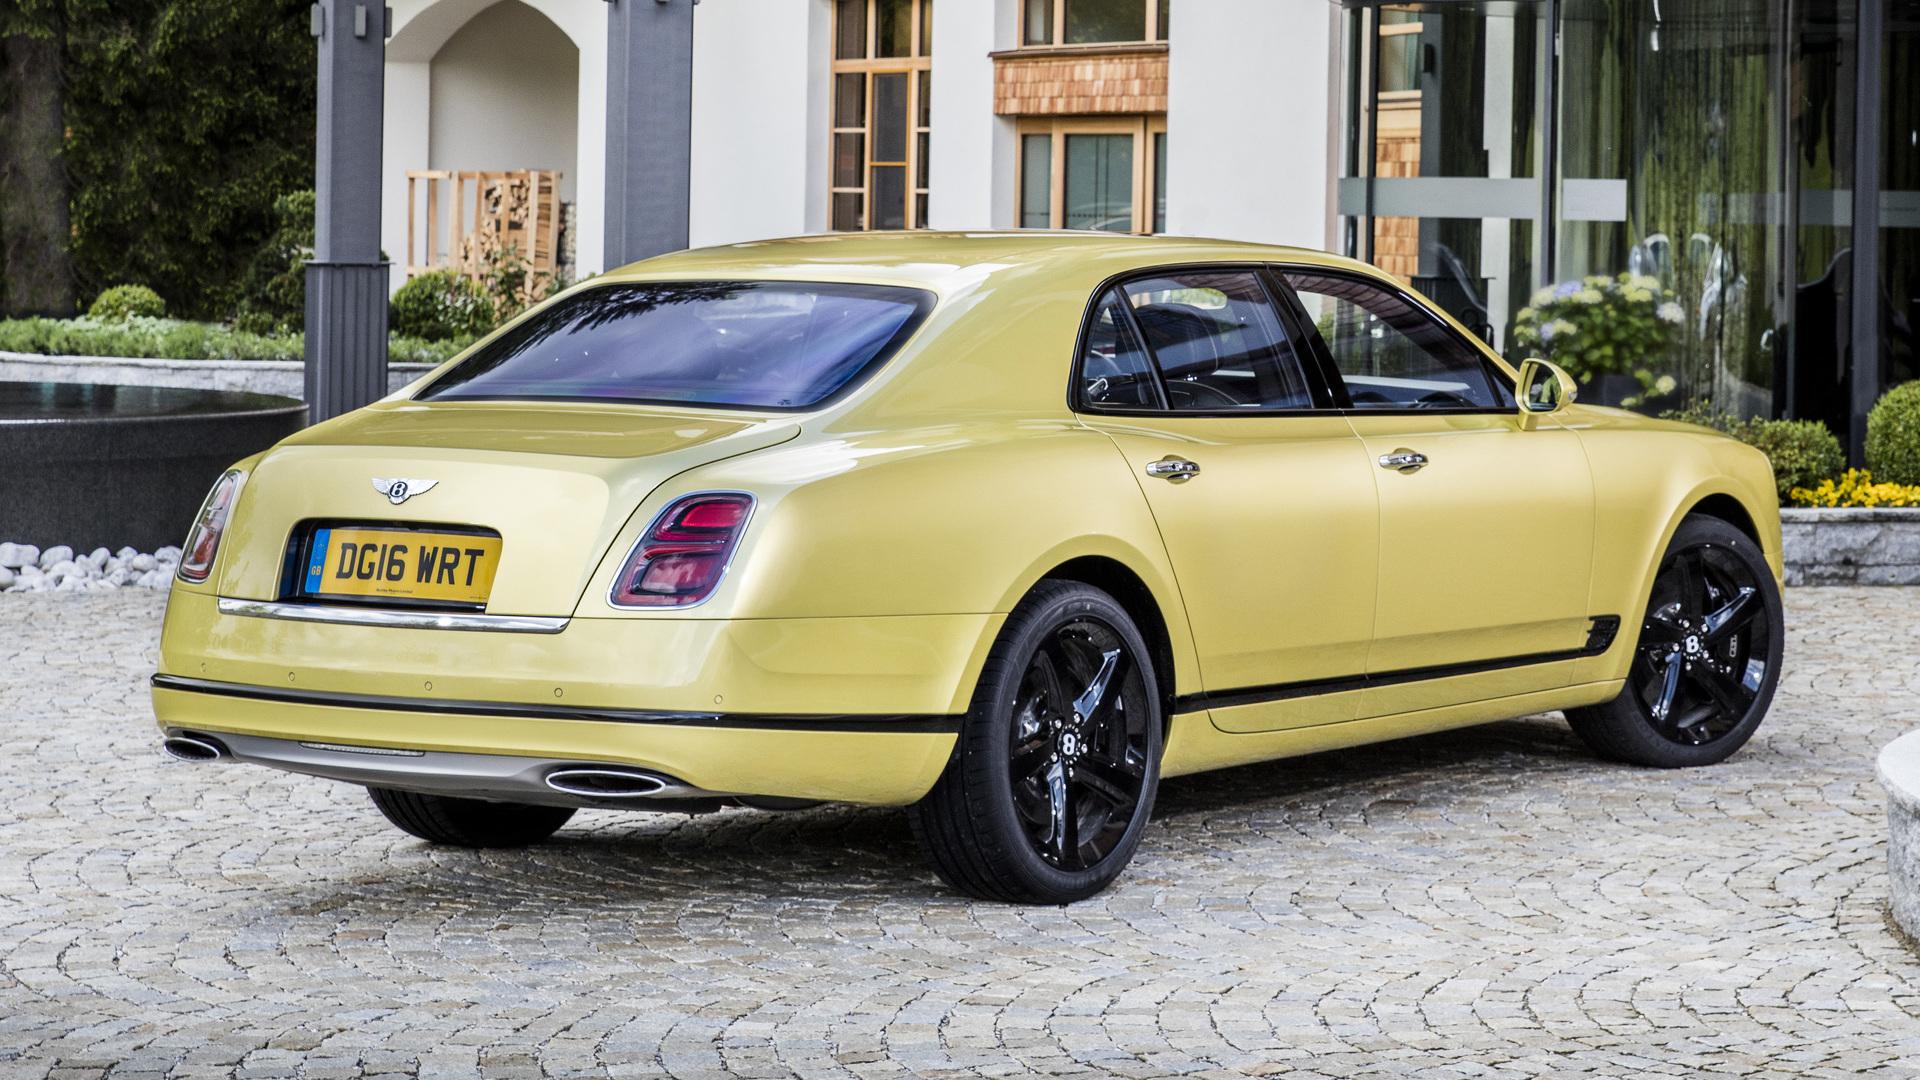 2017 Bentley Mulsanne Sd